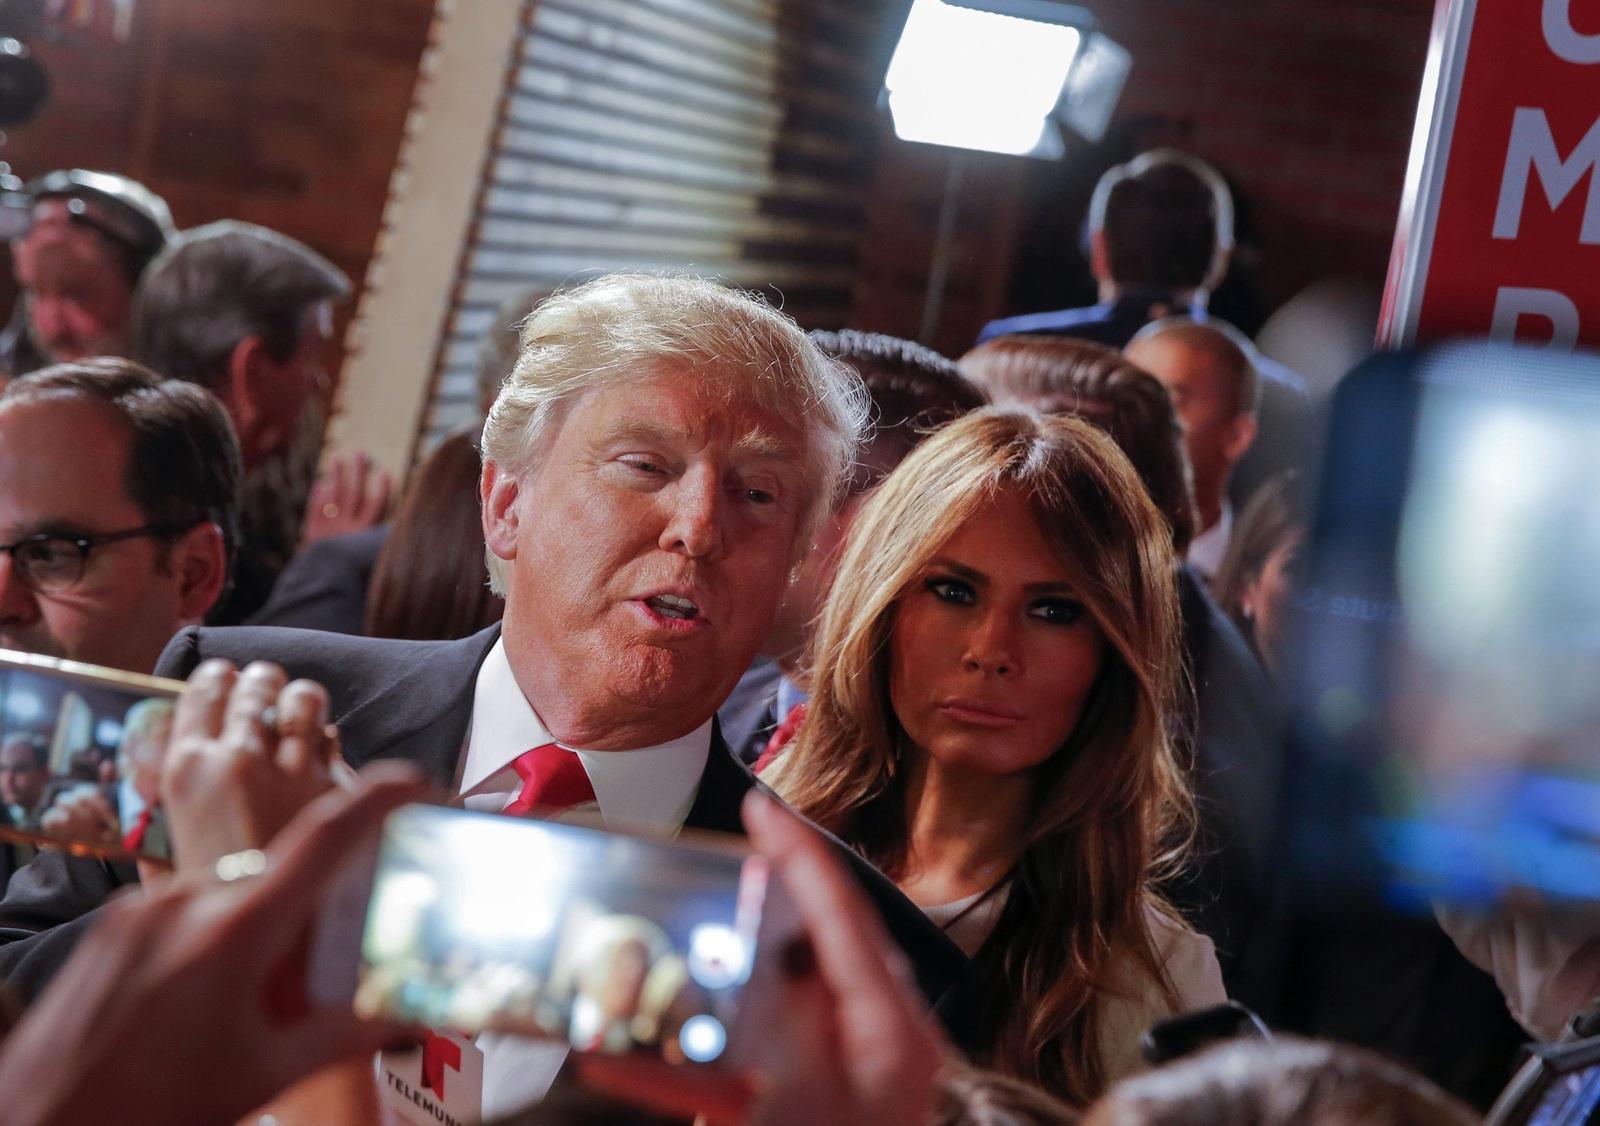 фото супруги трампа смотреть